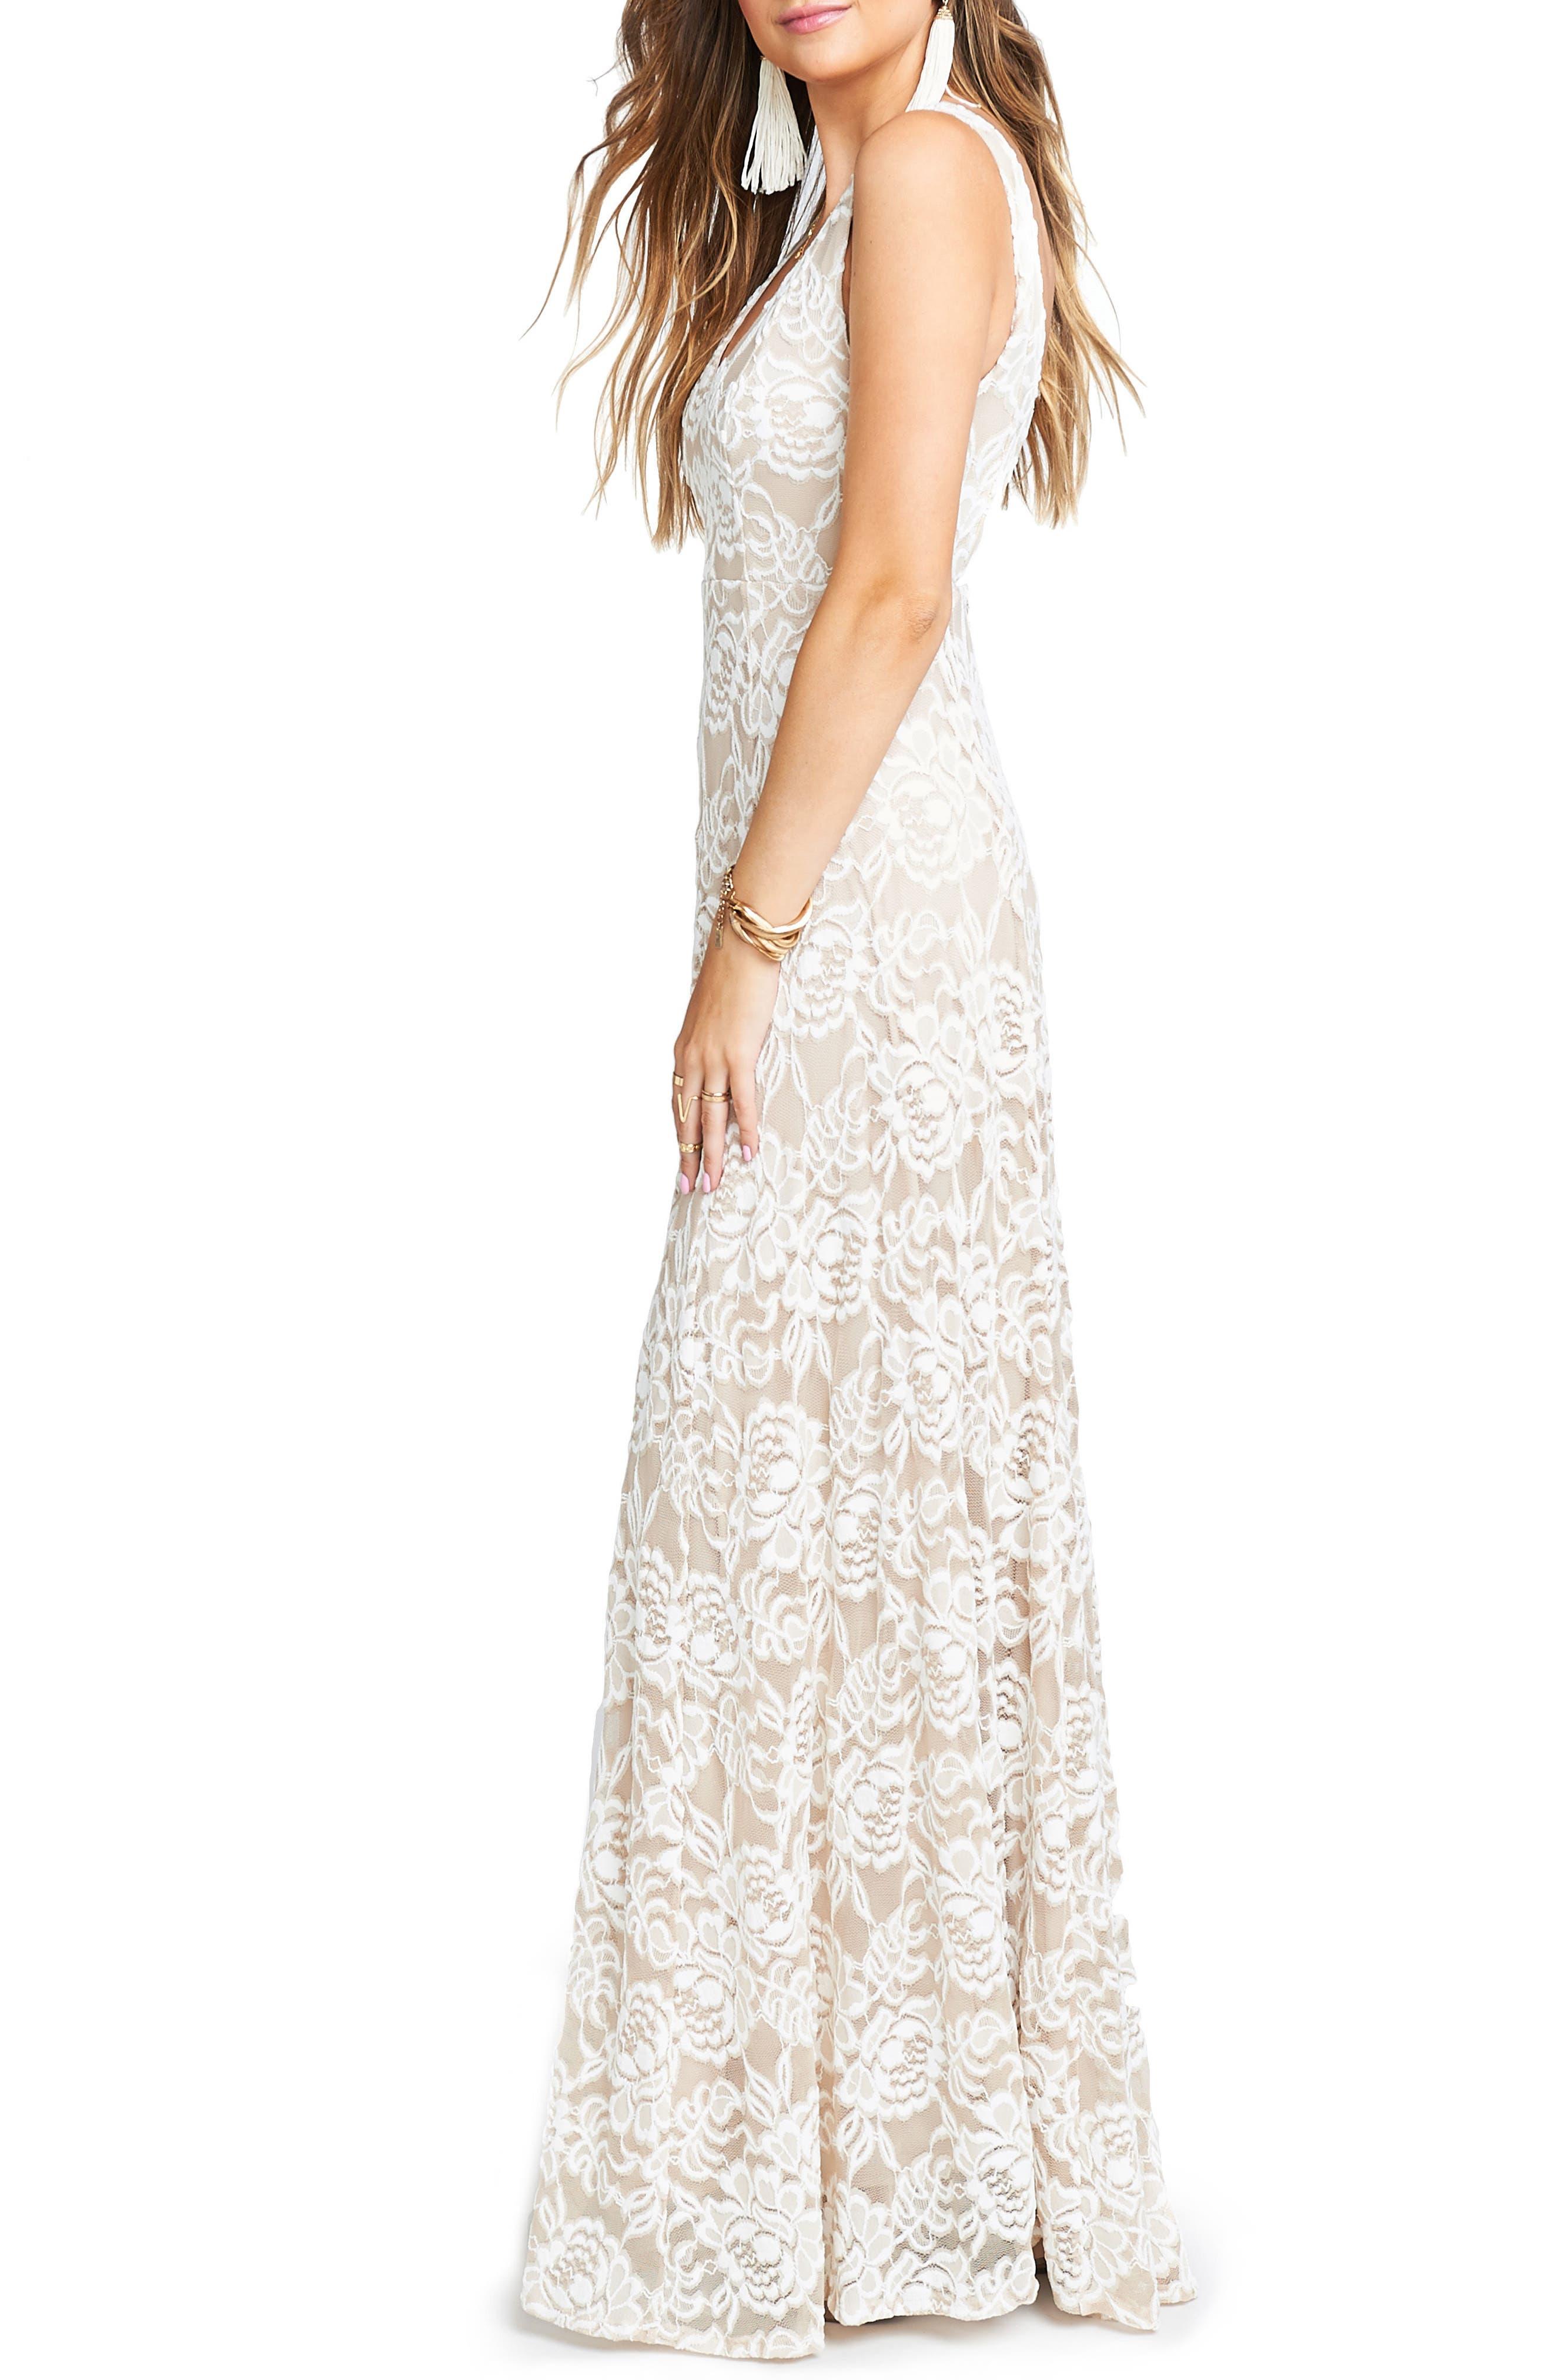 Jen Lace Dress,                             Alternate thumbnail 3, color,                             LOVERS LACE SHOW ME THE RING